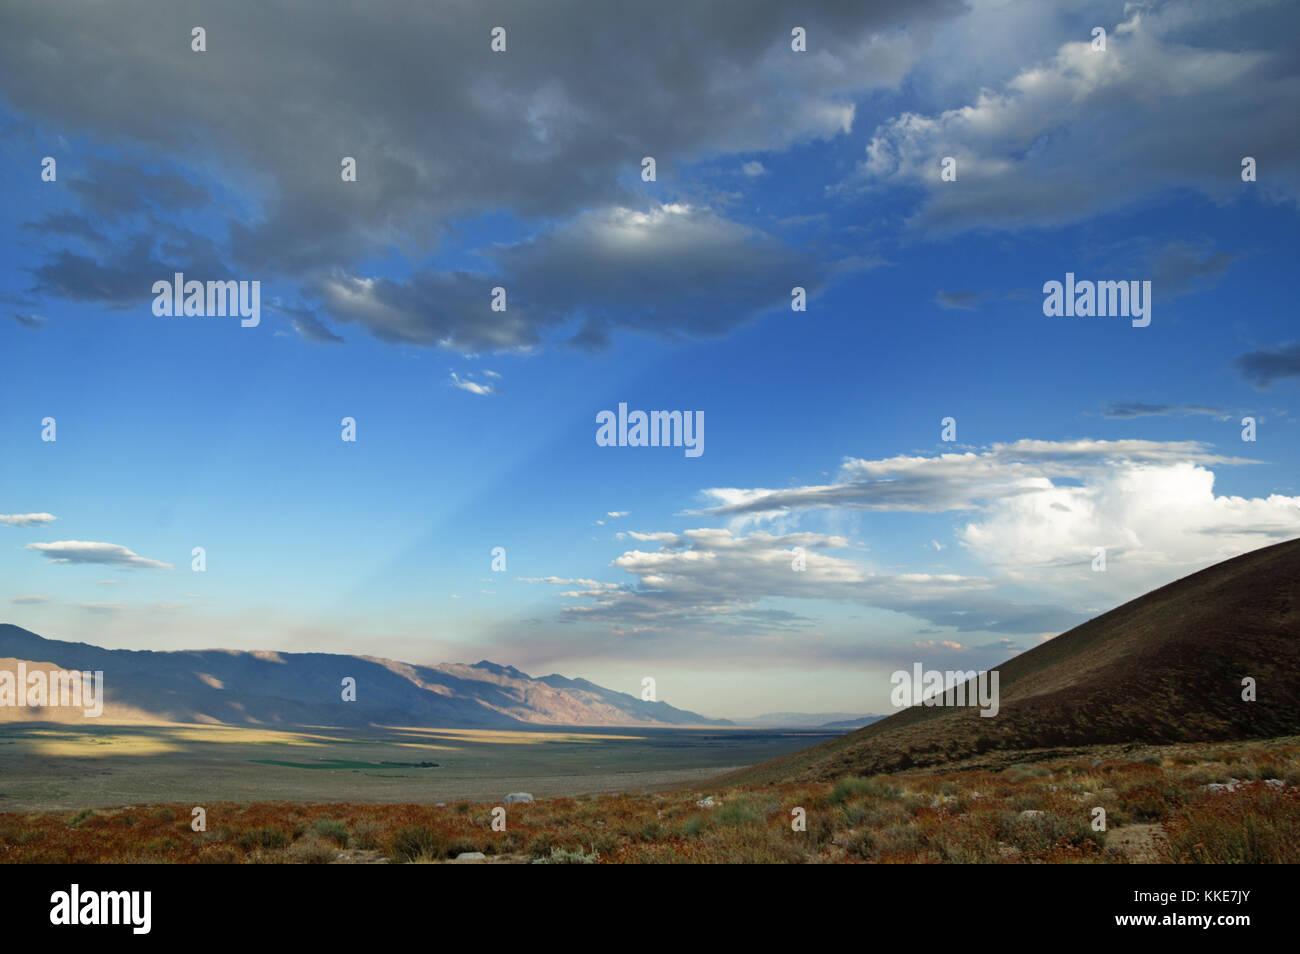 sunrays stream across the Owens Valley - Stock Image